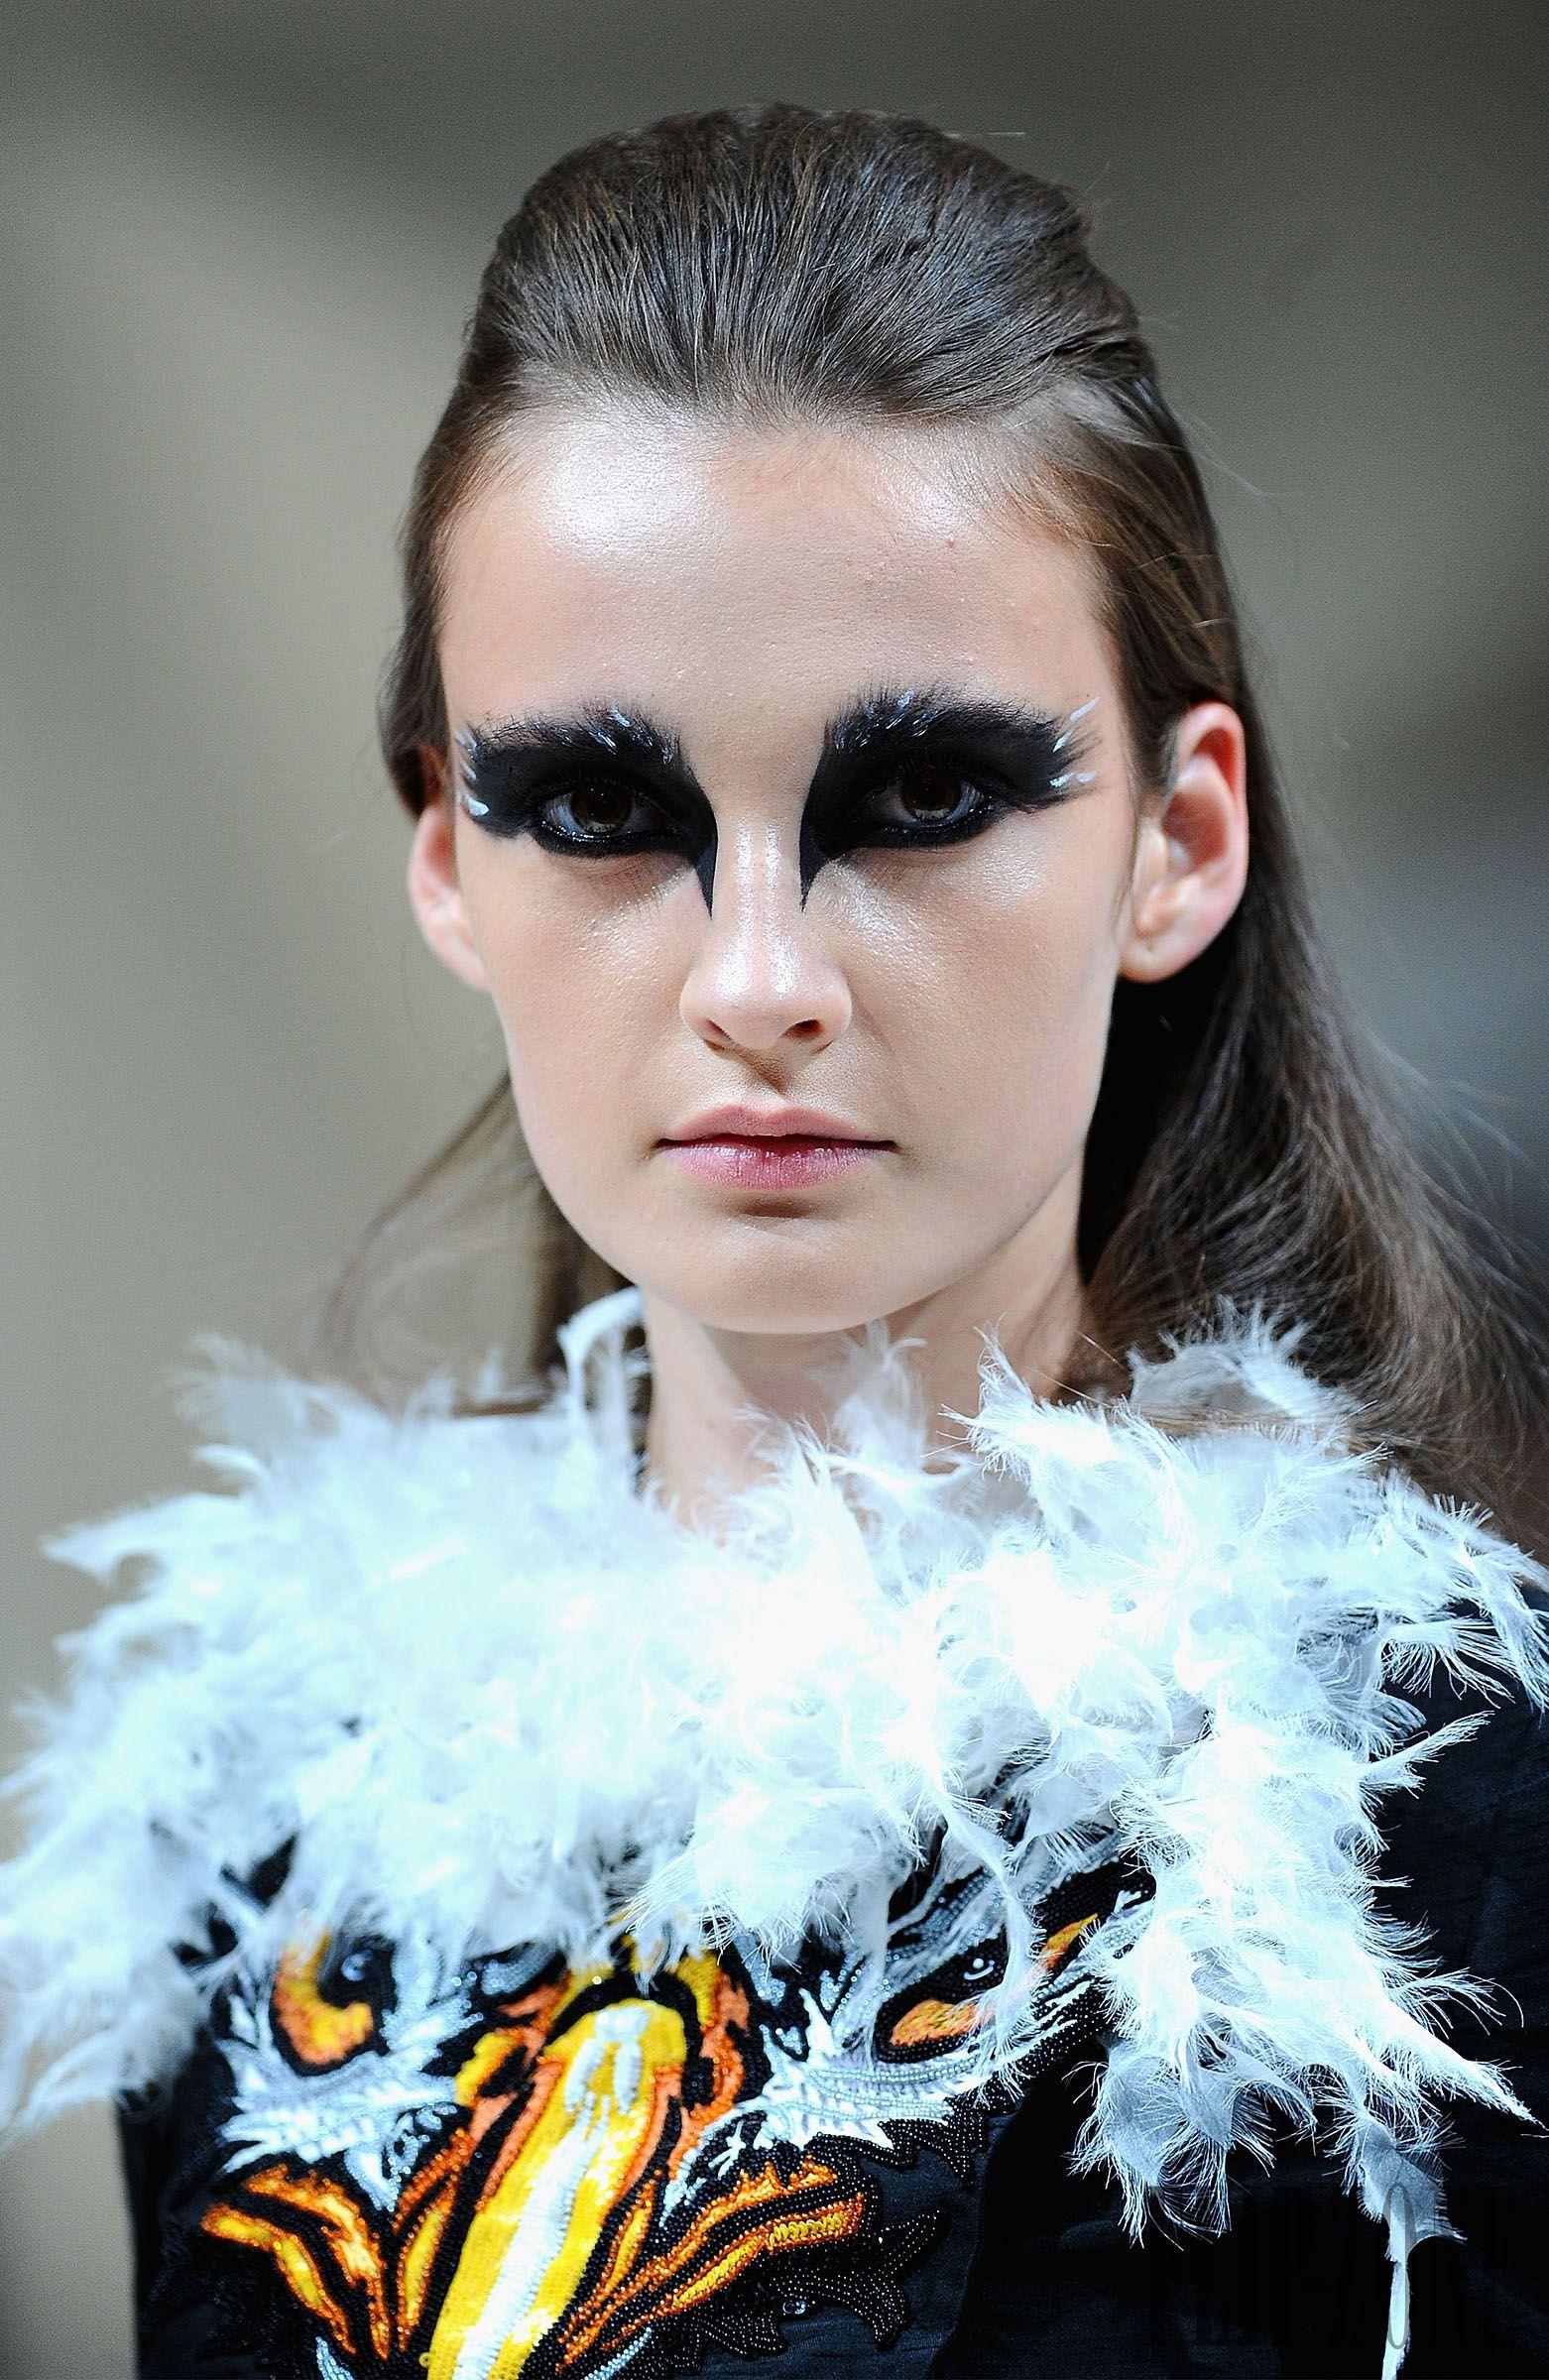 Jean Louis Sabaji Automne-hiver 2014-2015 - Haute couture - http://fr.flip-zone.com/jean-louis-sabaji-5128